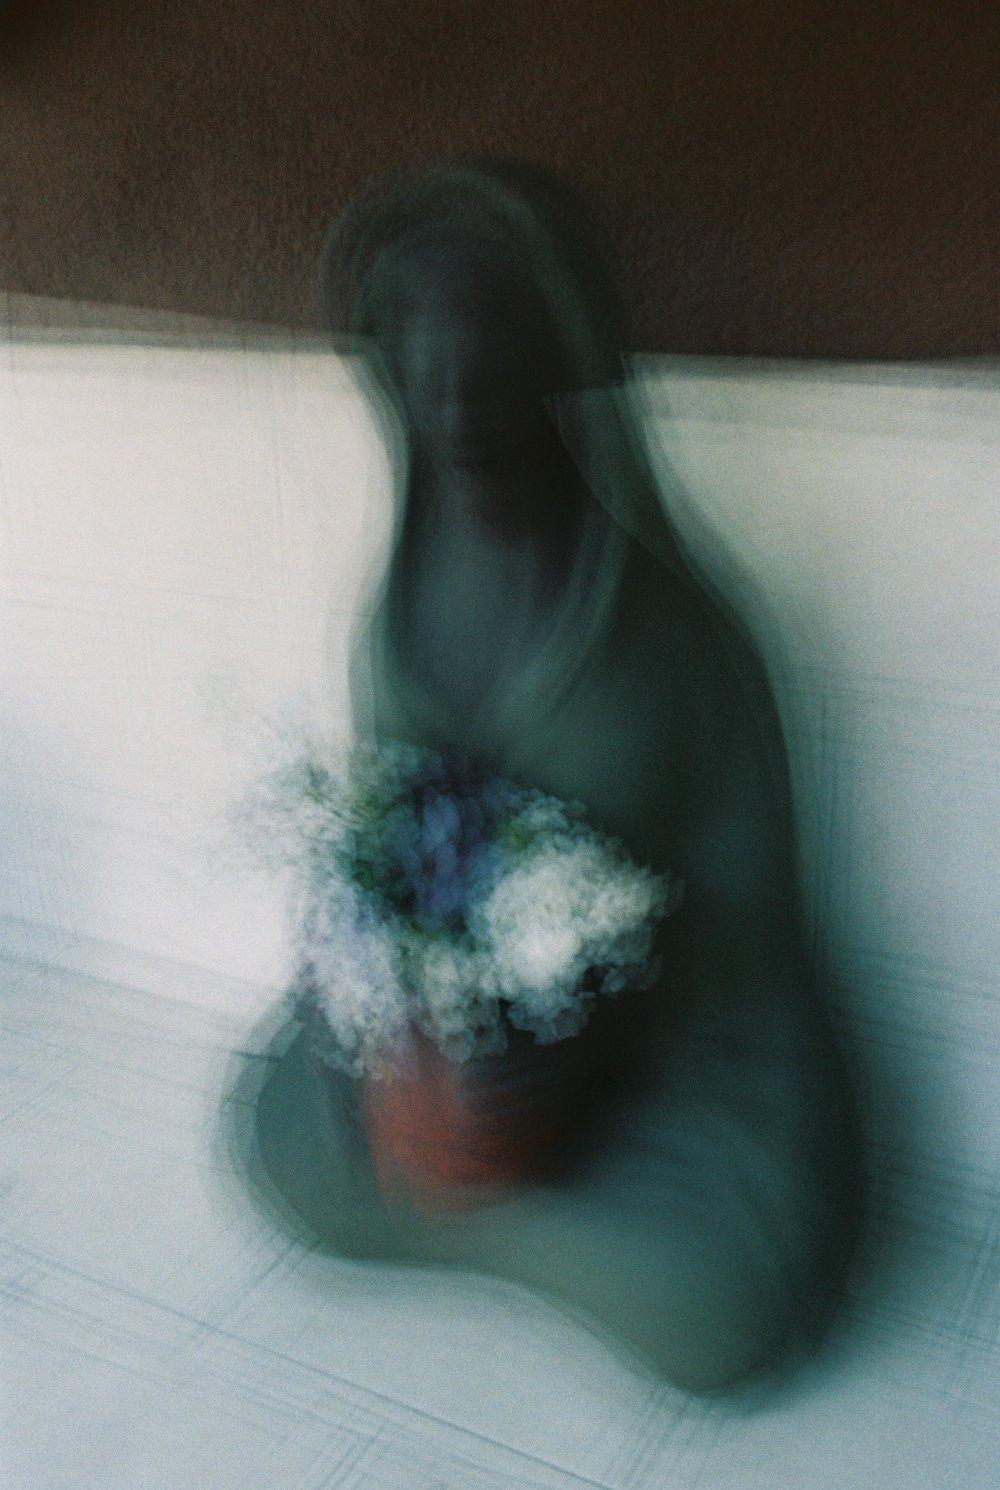 Efrain Bojorquez | Woman with flowers | Canon AE-1 Program | Kodak ProImage 100